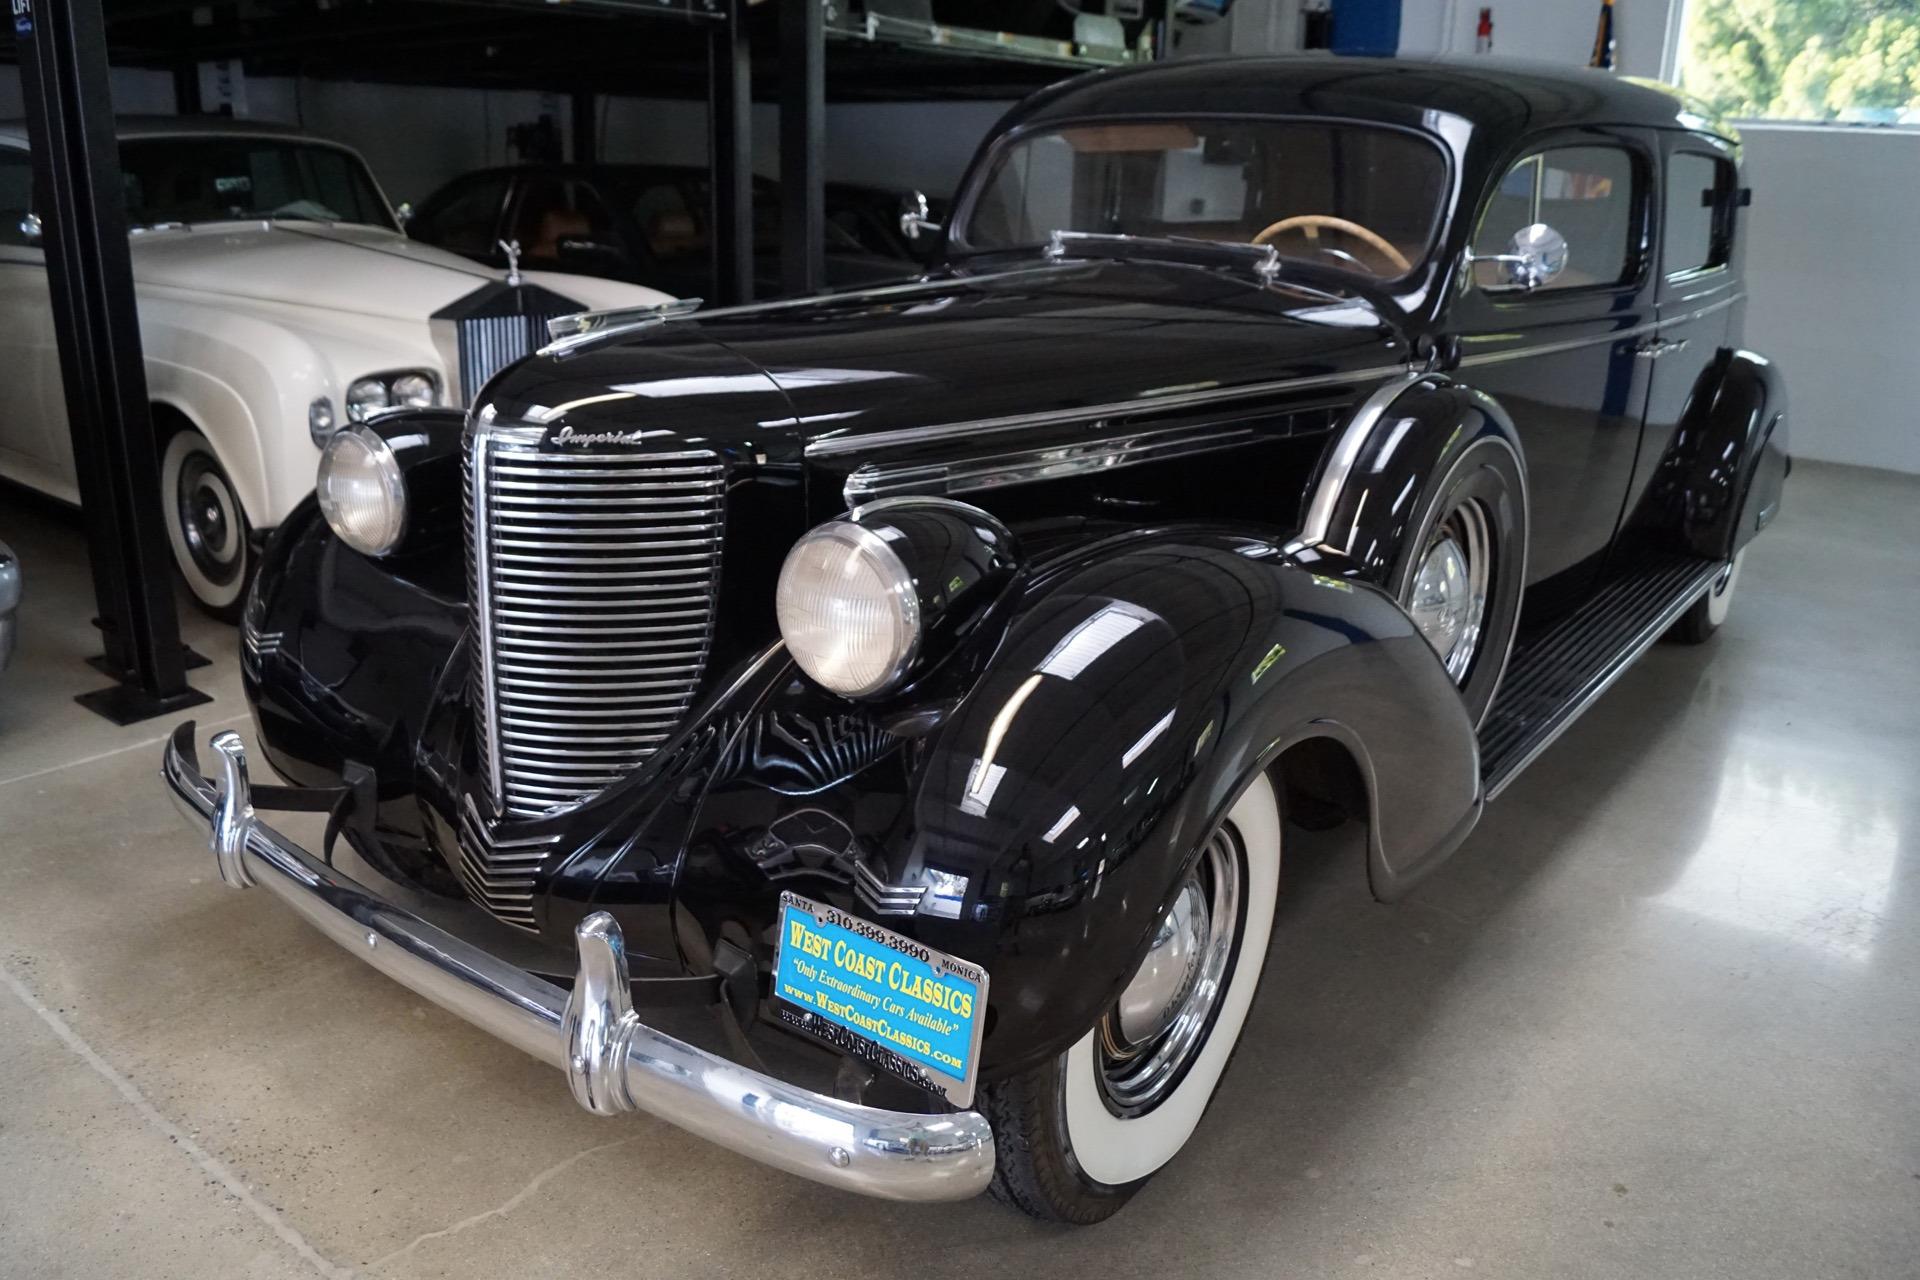 1938 chrysler custom imperial c20 limousine sedan limousine coachwork stock 188 for sale near. Black Bedroom Furniture Sets. Home Design Ideas